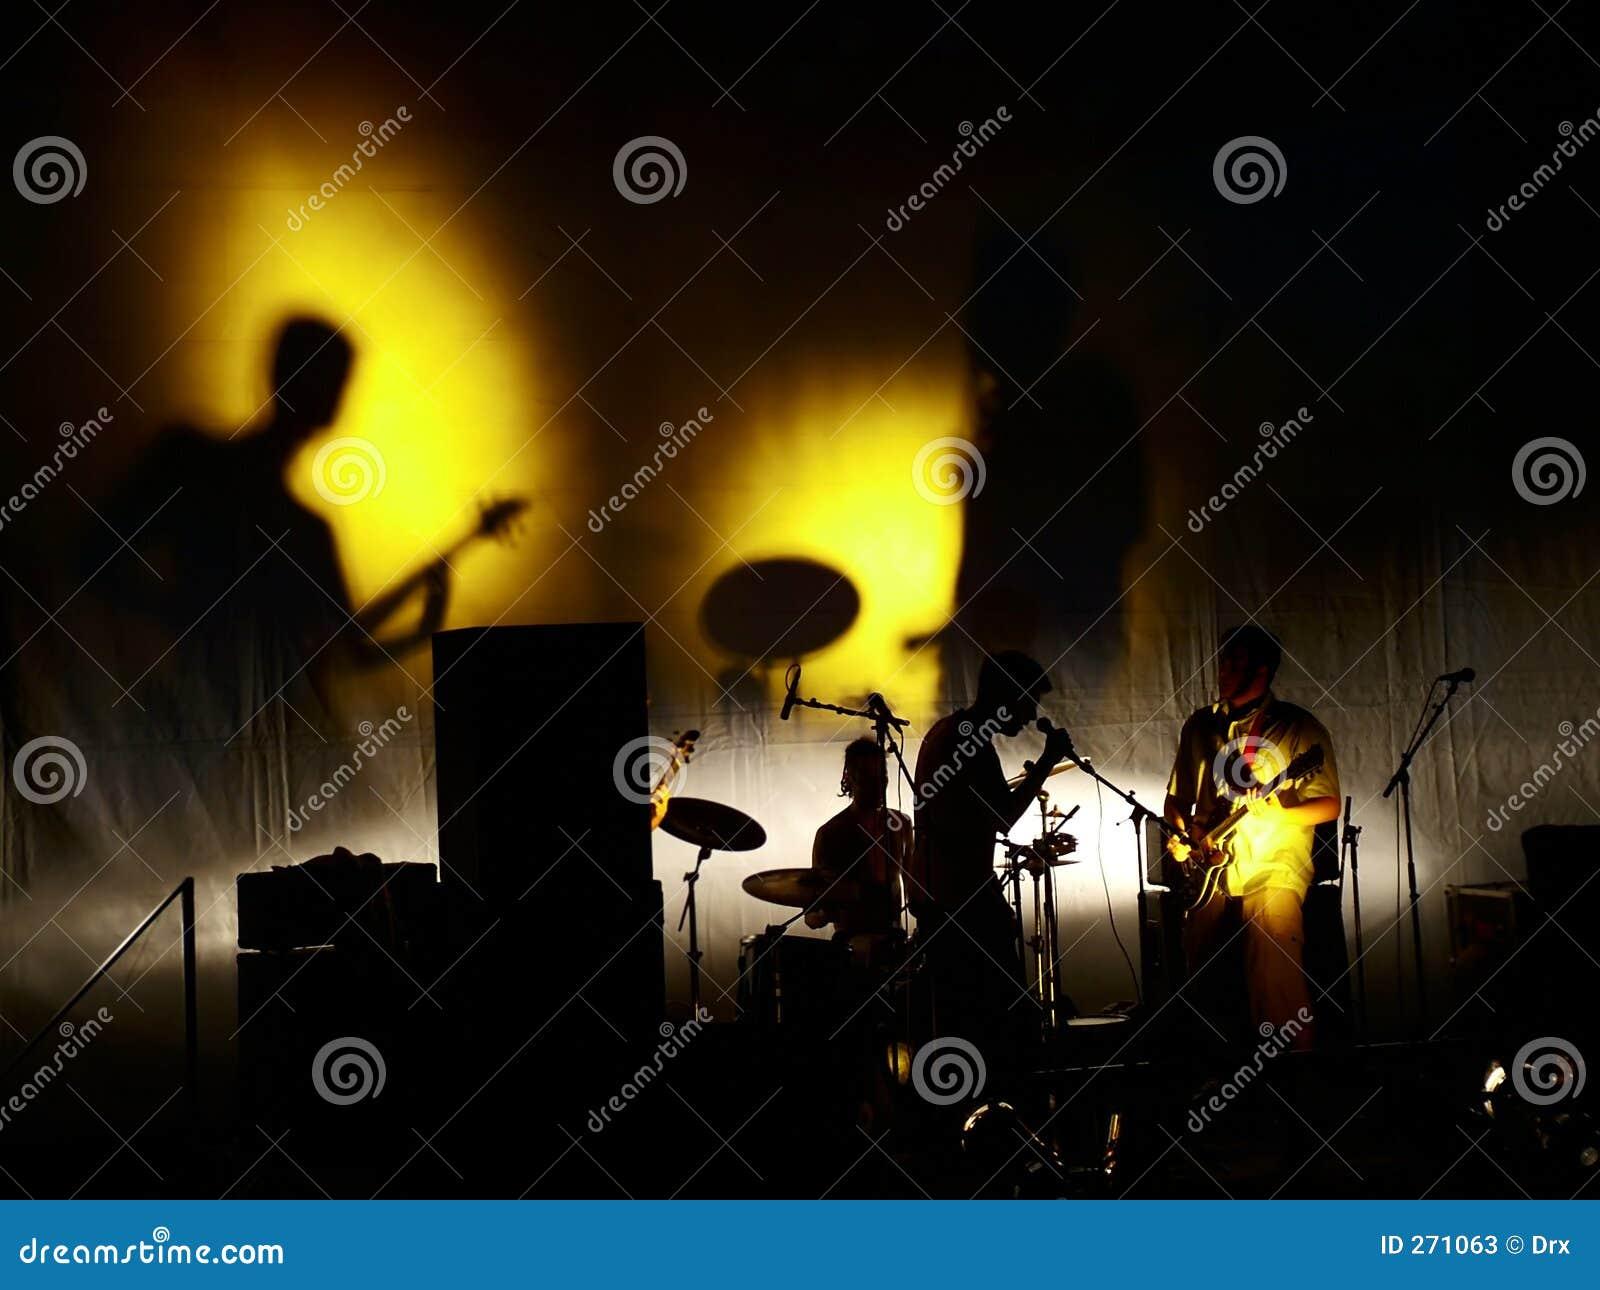 Shadows music concert